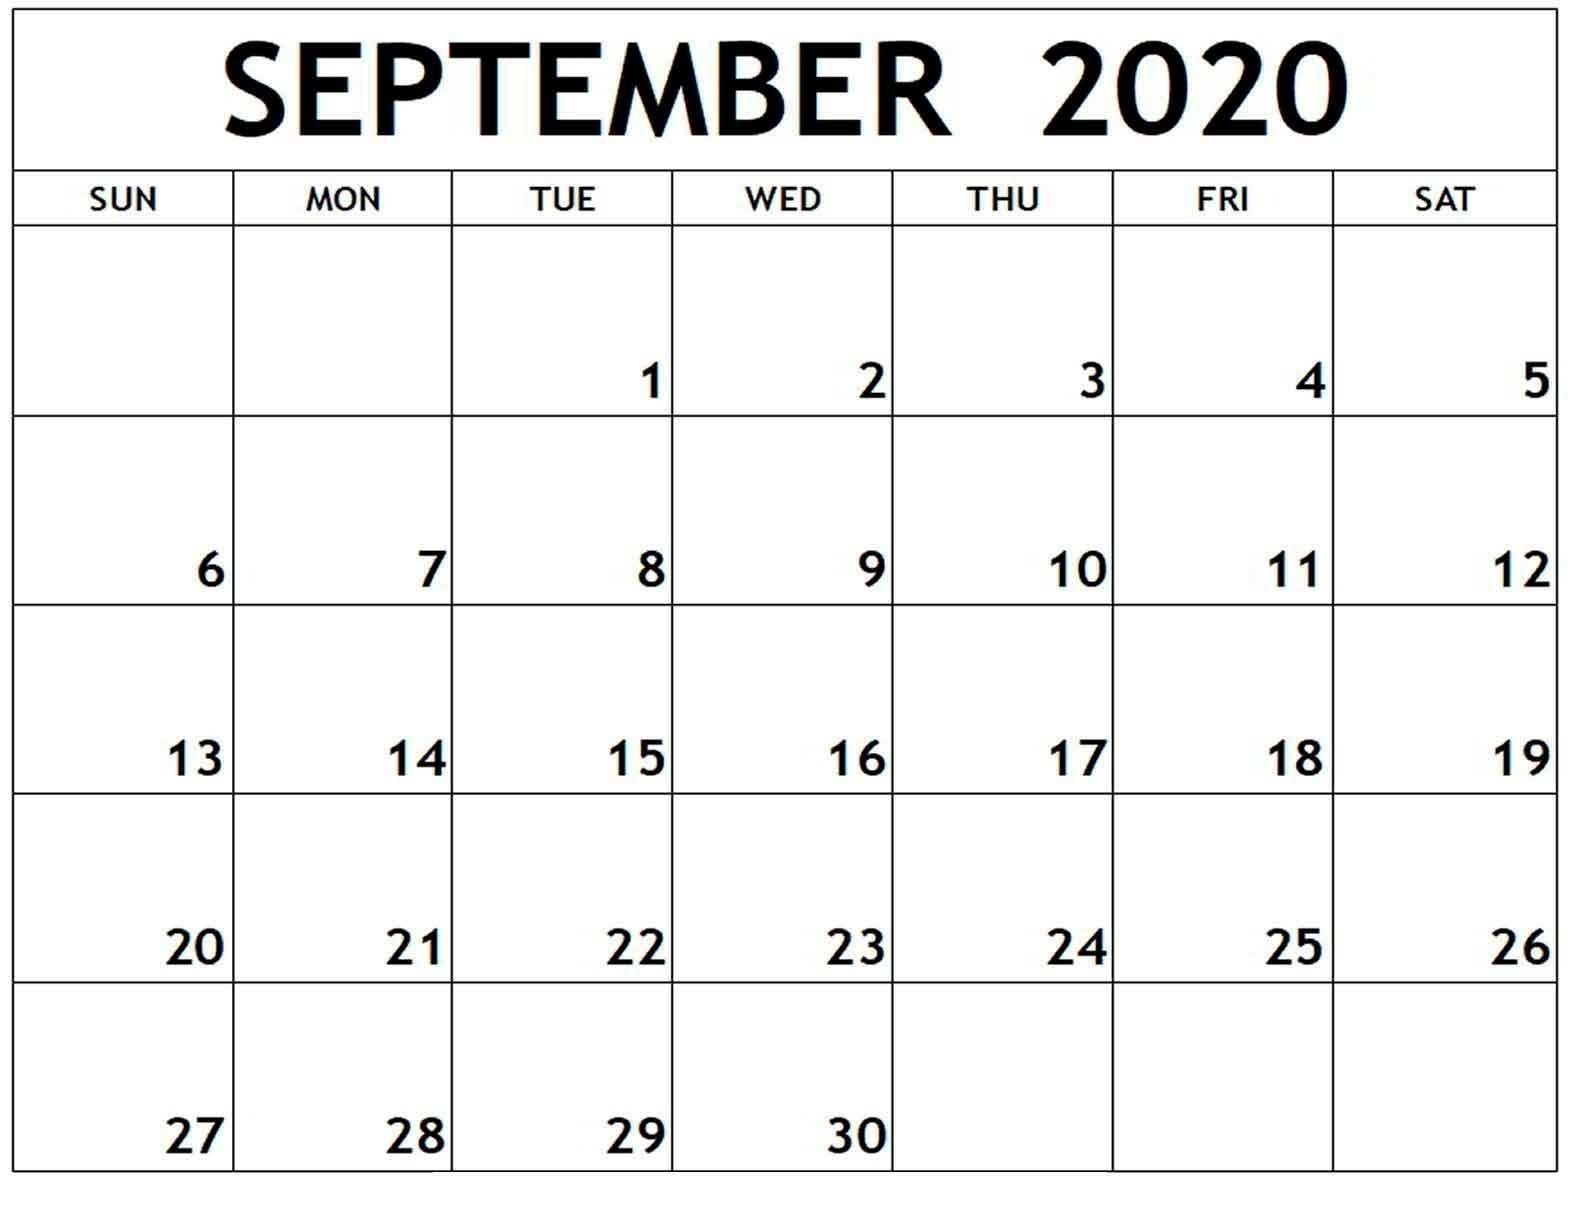 Printable Monthly Calendar September 2020 - Free Printable